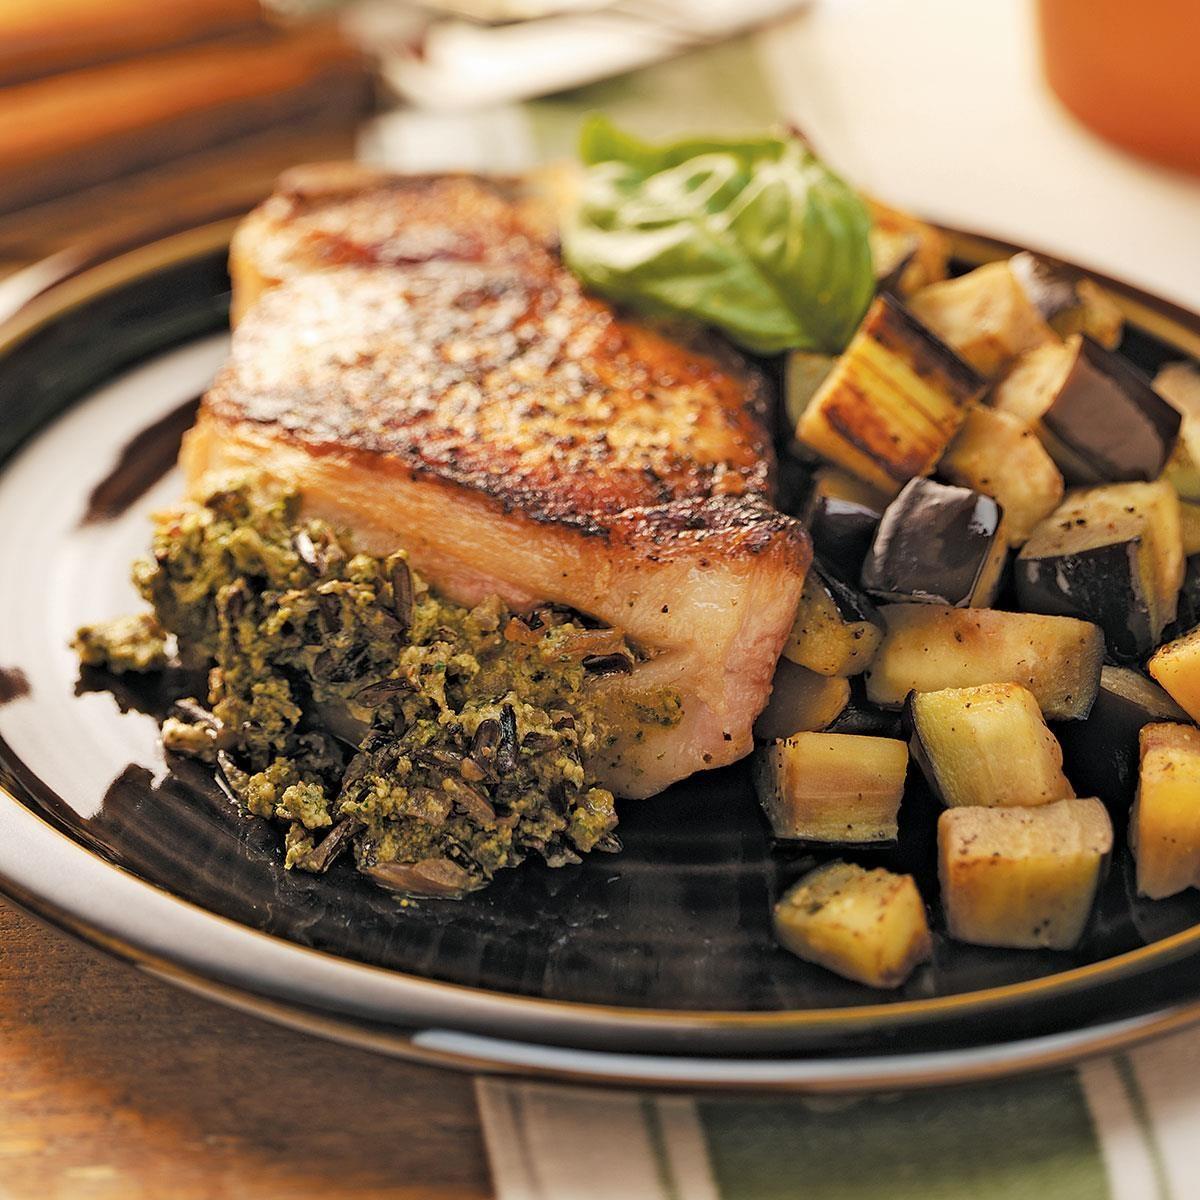 Pork chops recipe and rice